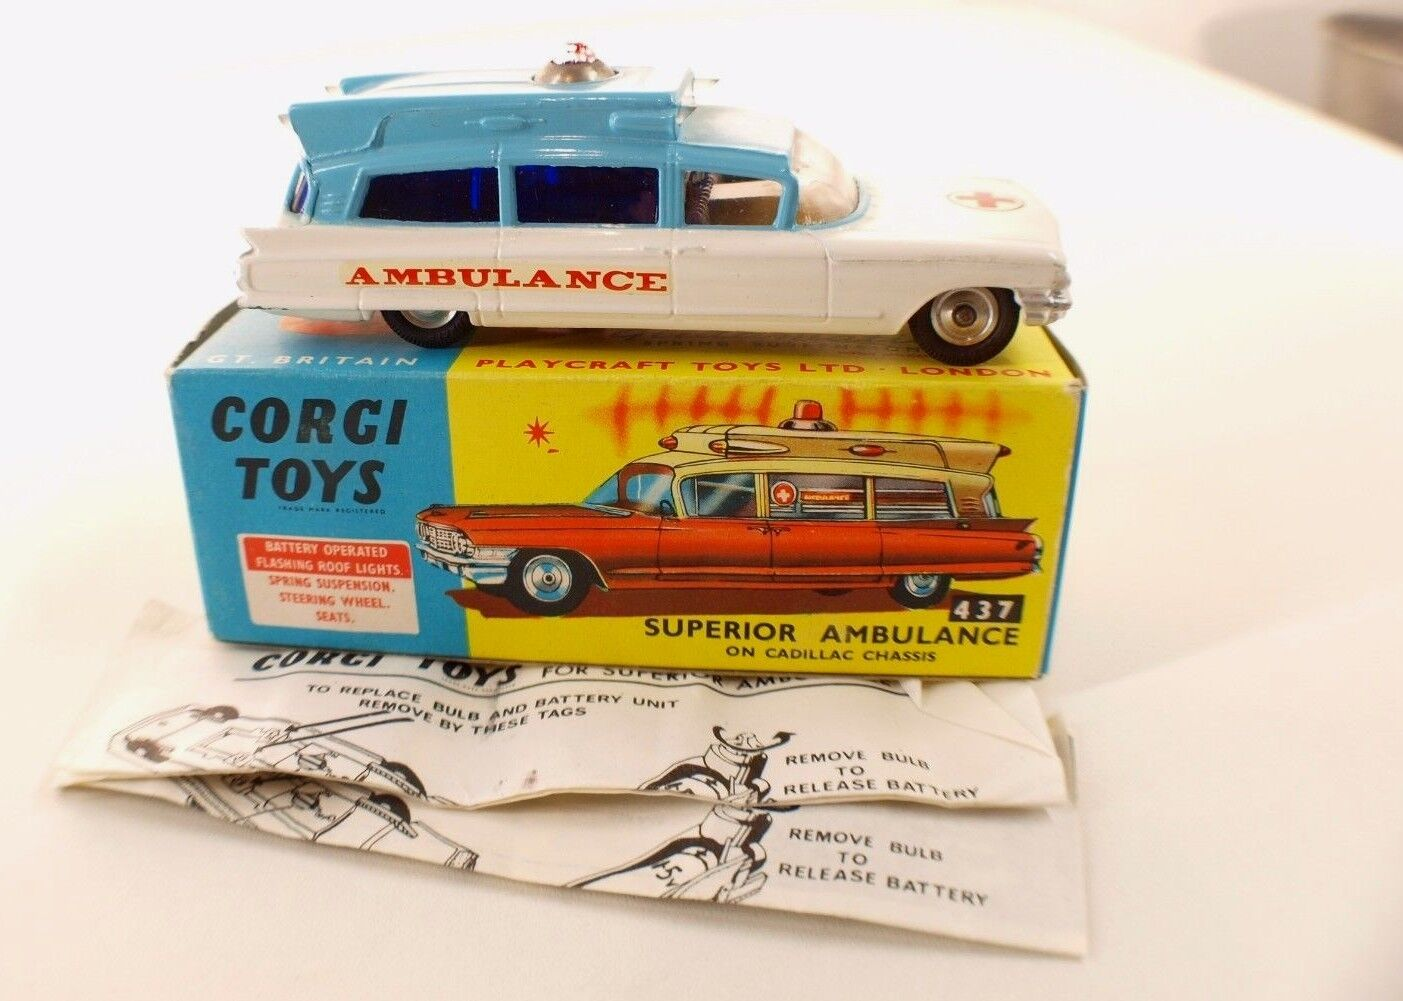 Corgi Toys N º 437 Ambulancia Superior On Cadillac Chasis en Caja